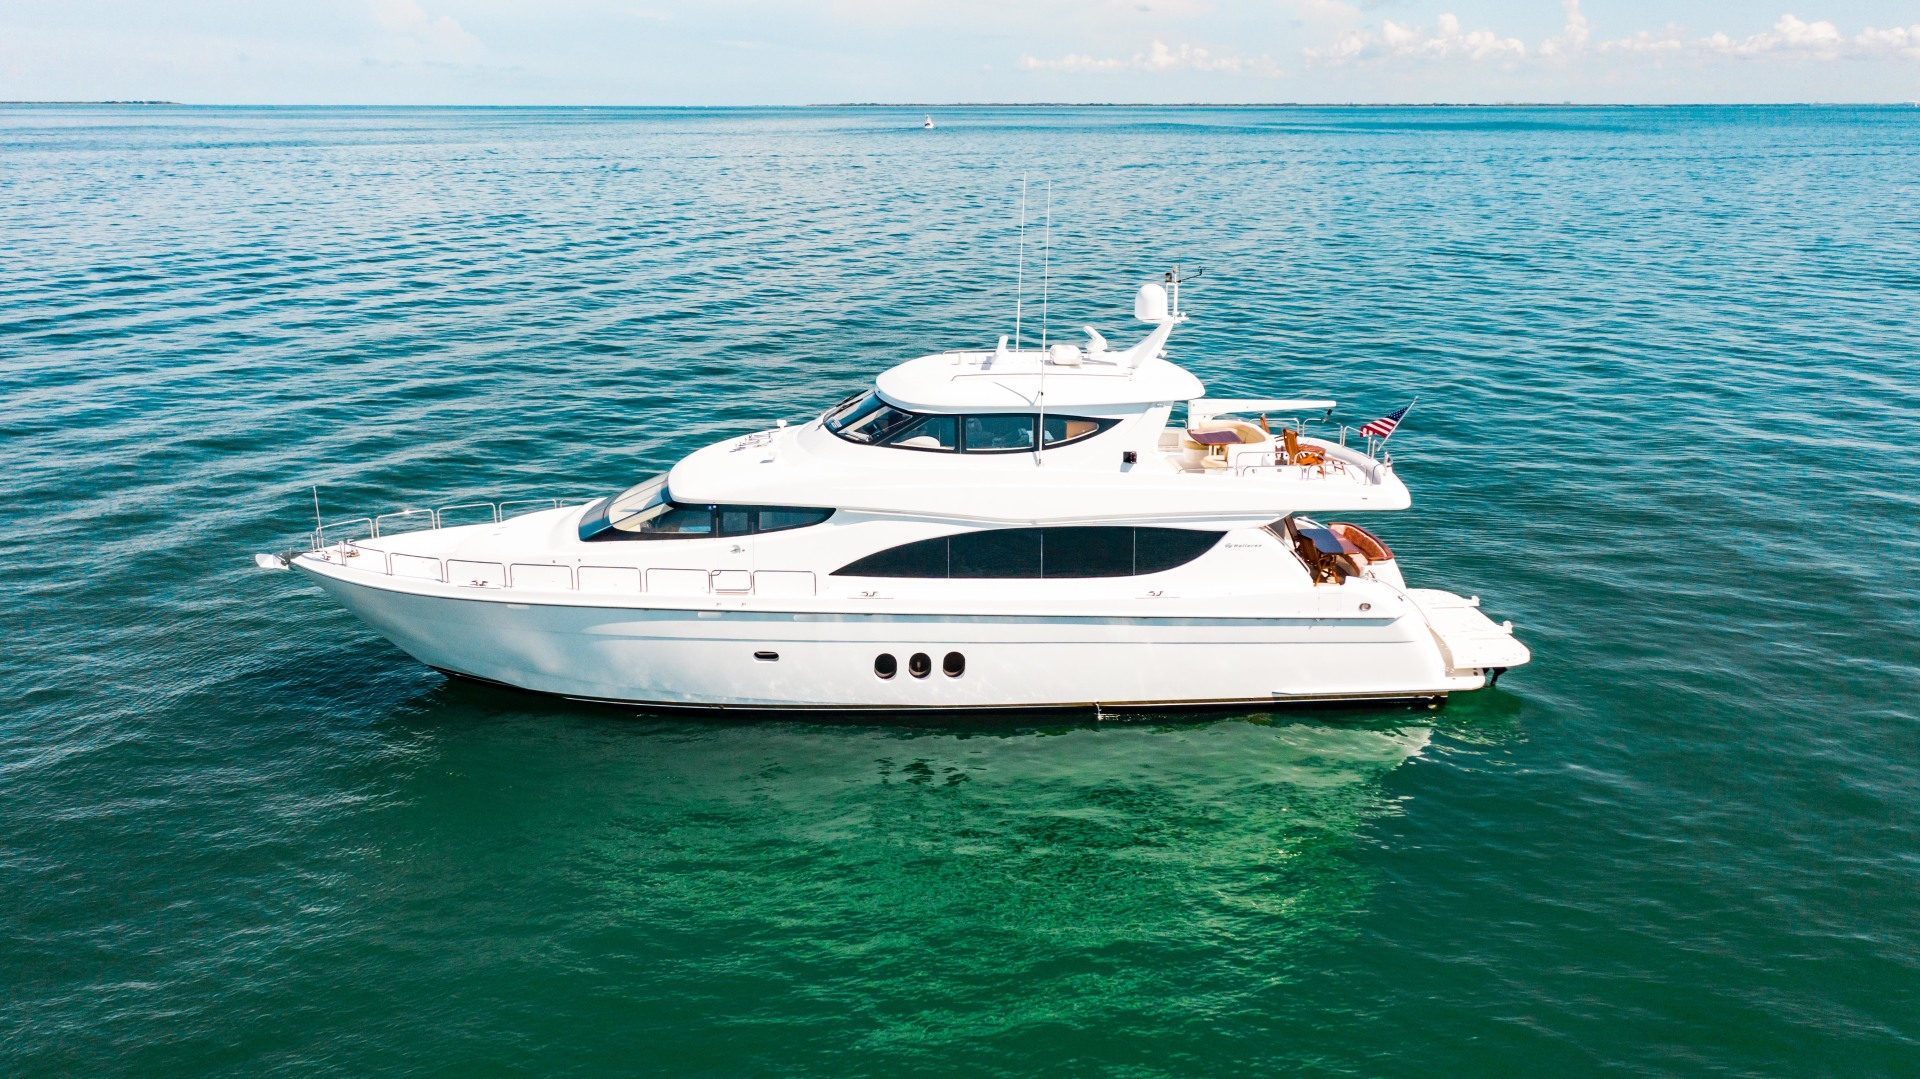 Hatteras-80 Motor Yacht 2008-Galati Yacht Sales Trade Anna Maria-Florida-United States-2008 Hatteras 80 Motor Yacht  Galati Yacht Sales Trade-1466265 | Thumbnail